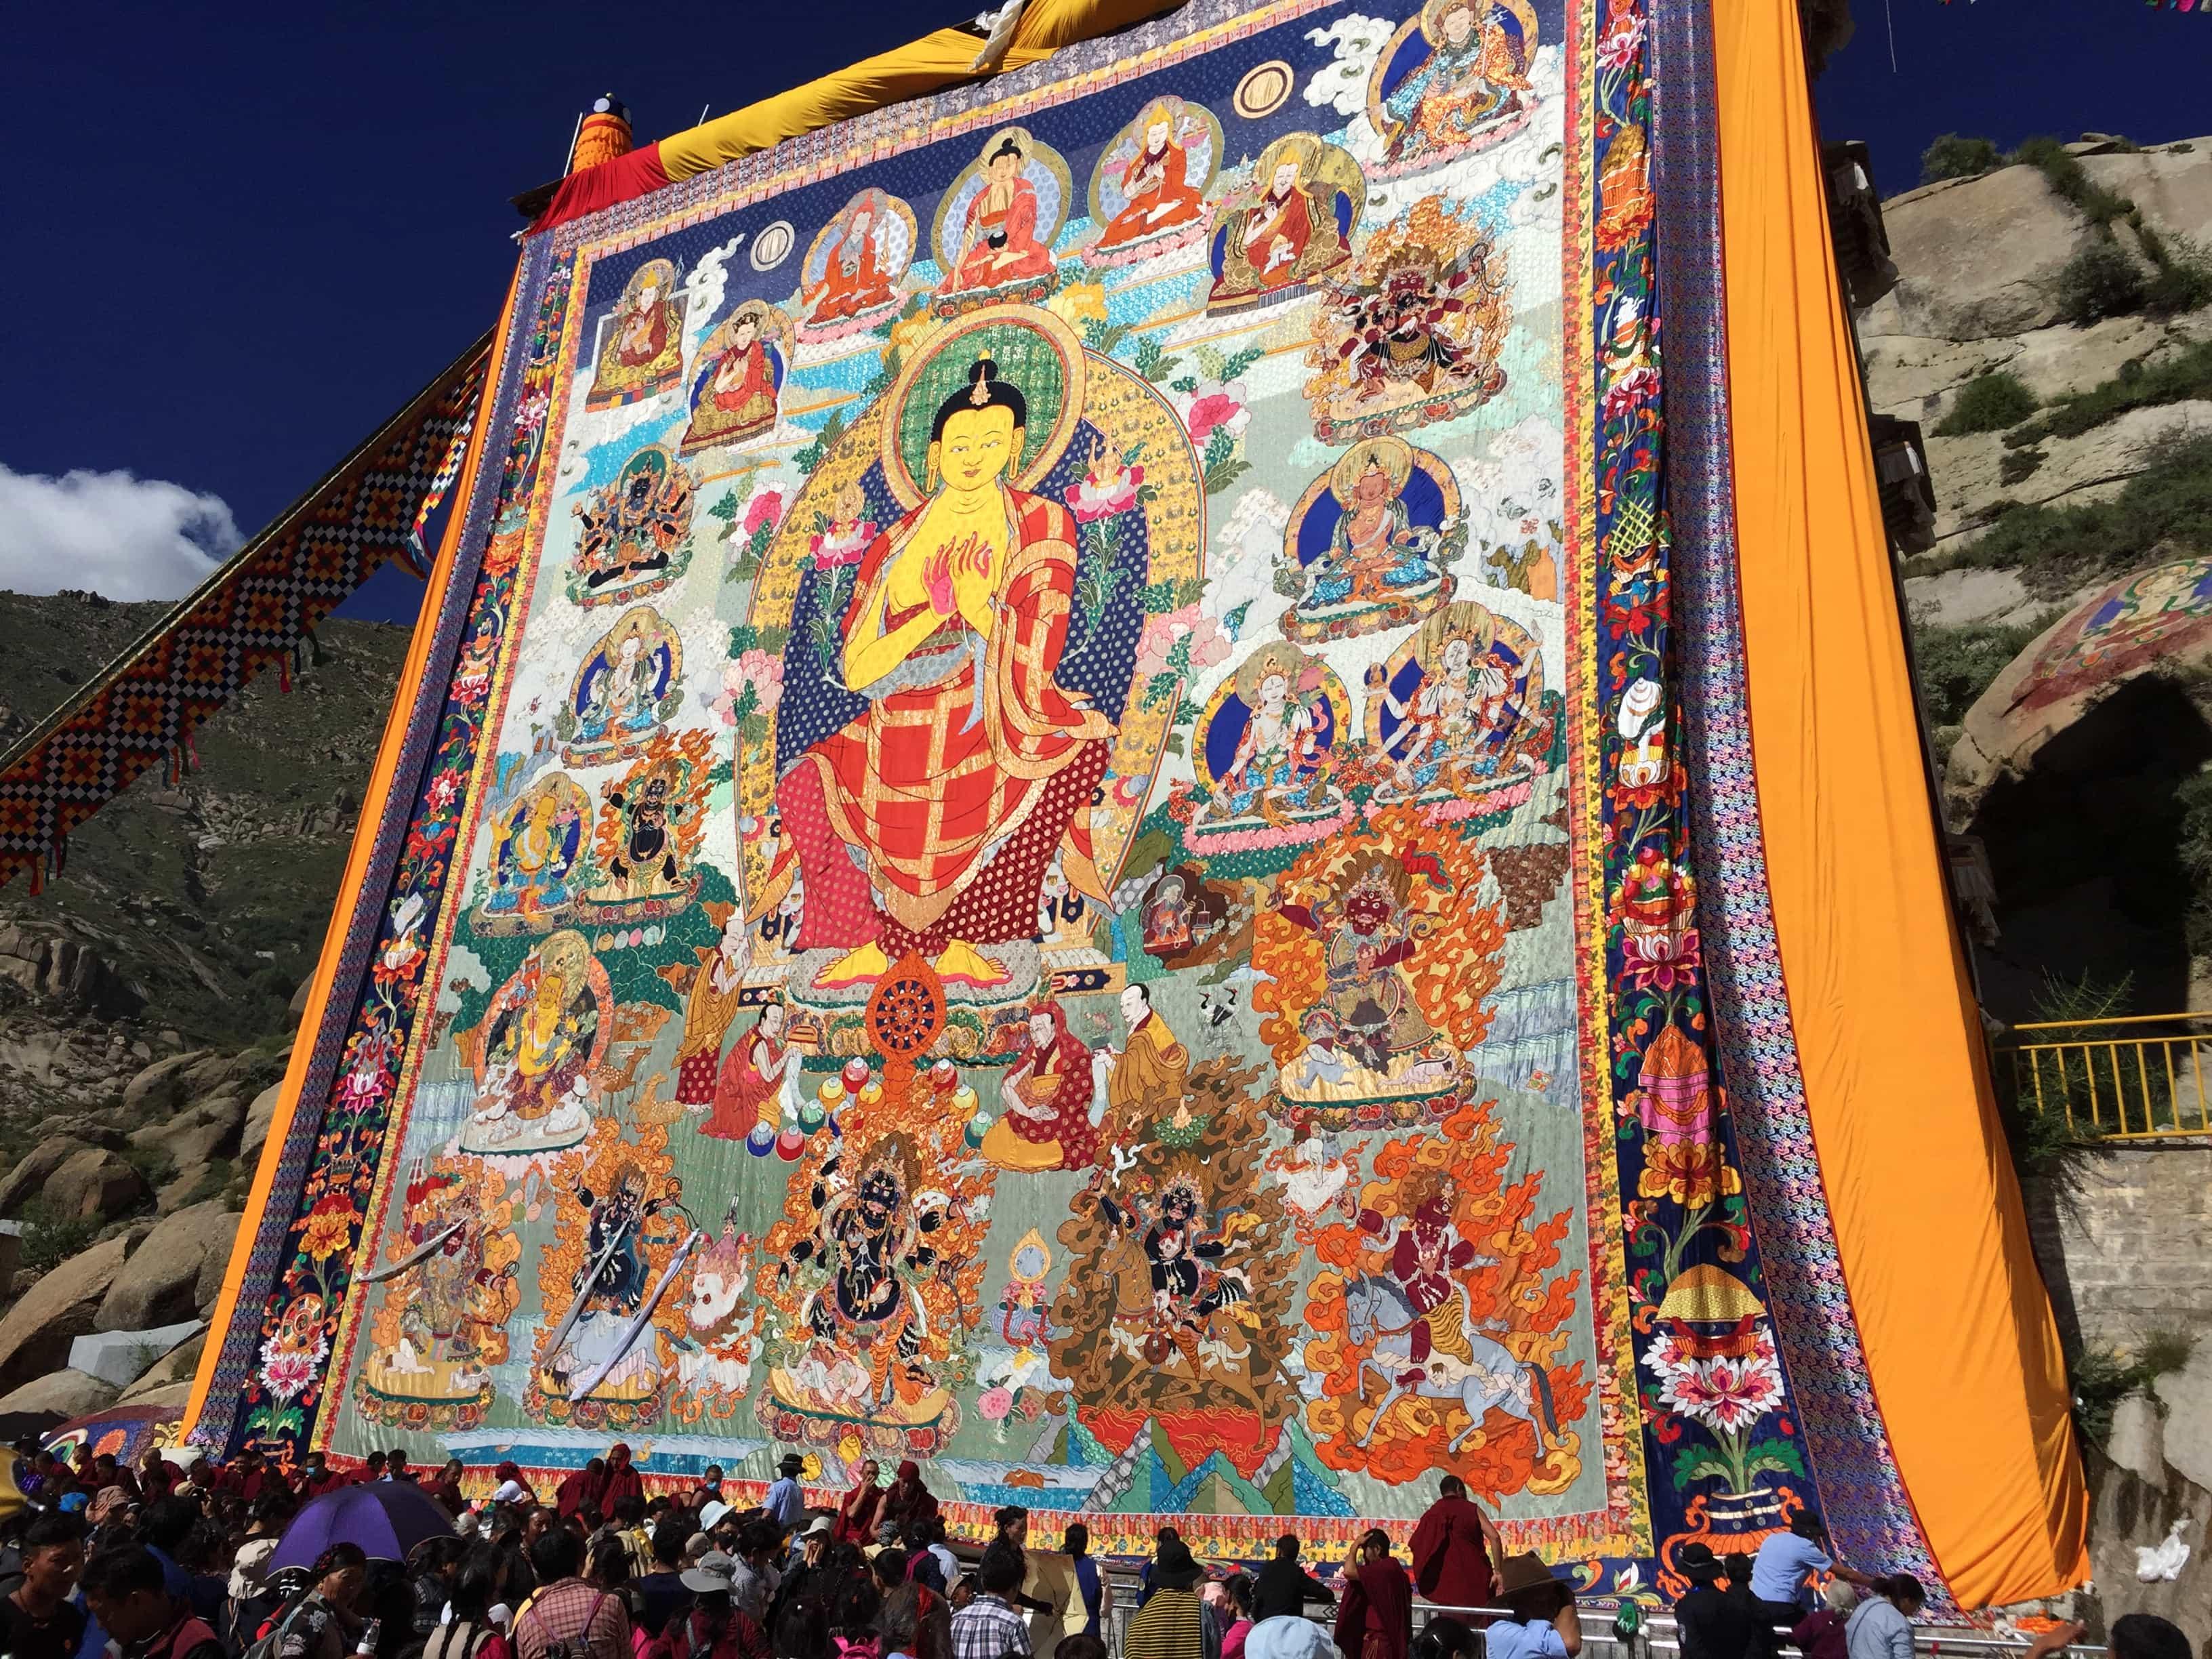 Shoton Festival Thangka - Buddha Painting display